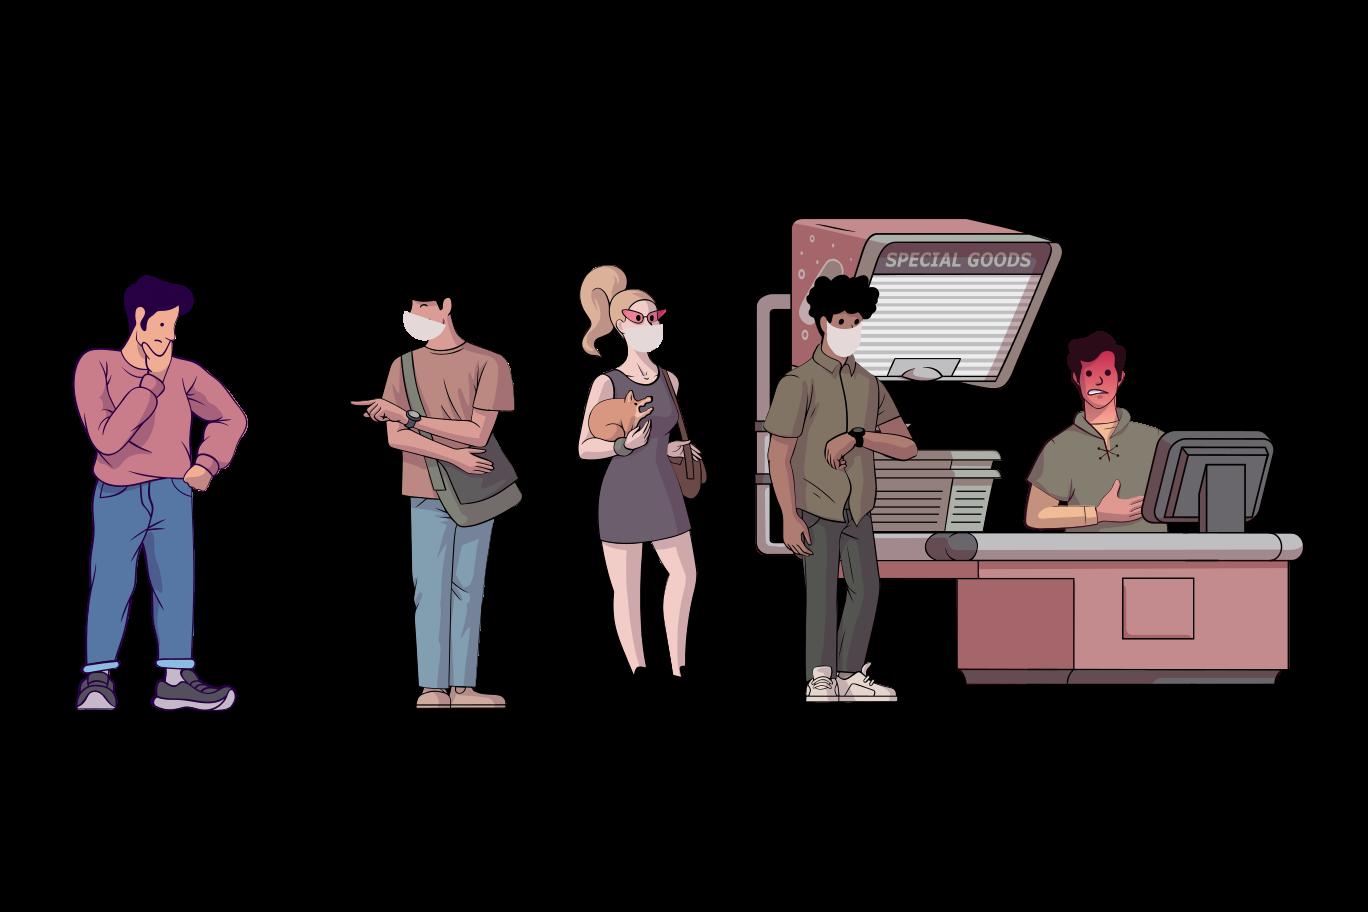 mantenha distância Clipart illustration in PNG, SVG